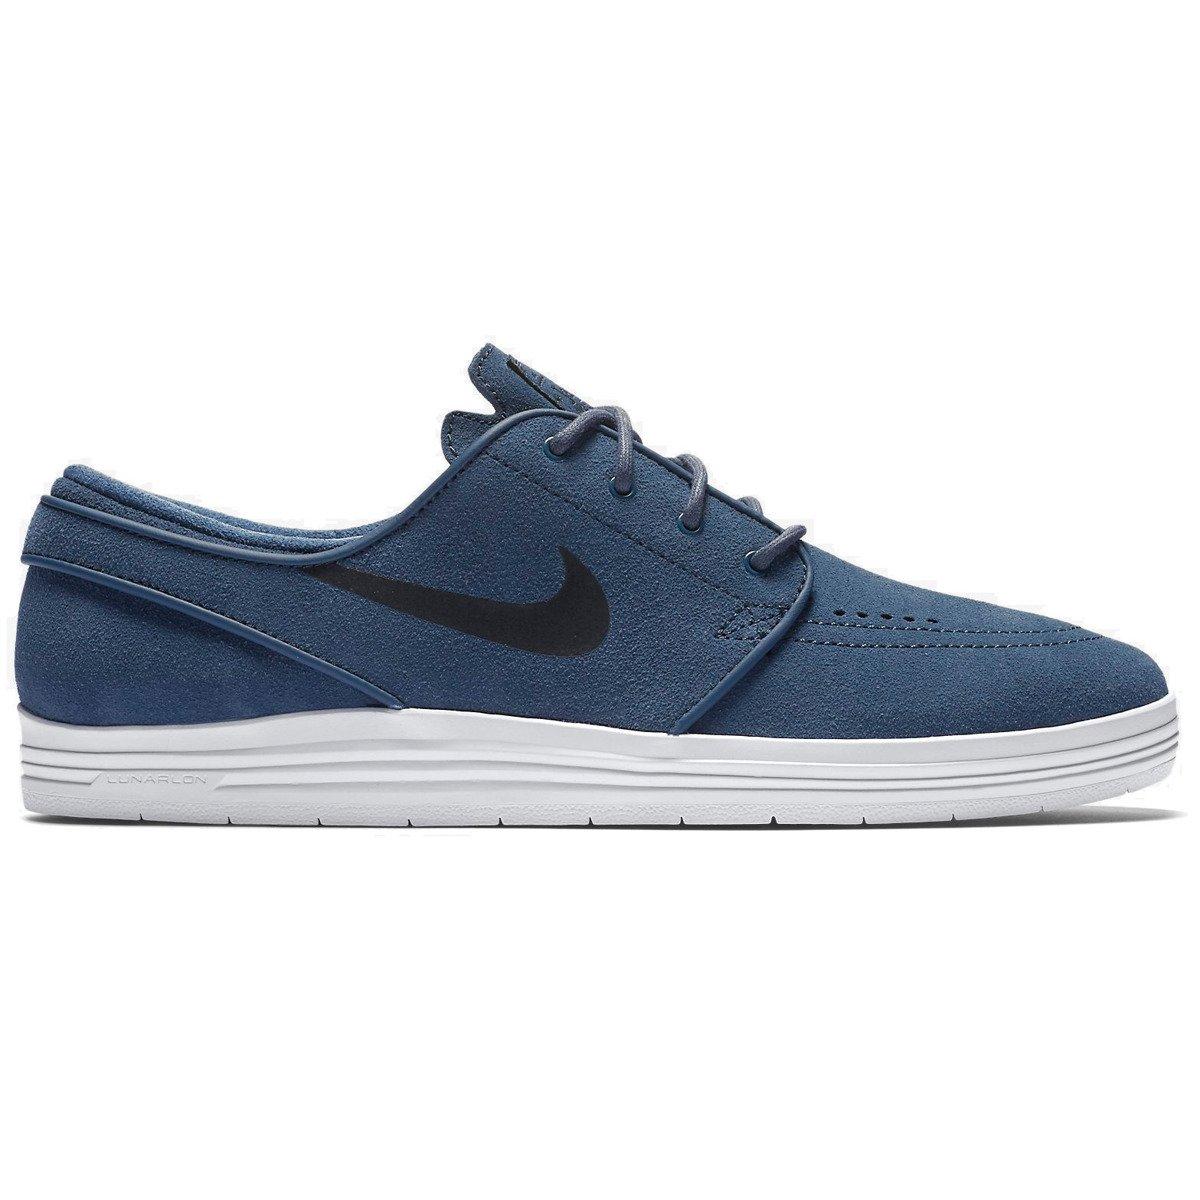 100% authentic f09a0 2d6bf ... closeout buty nike sb lunar stefan janoski squadron blue black white  granatowy shoes nike sb shoes